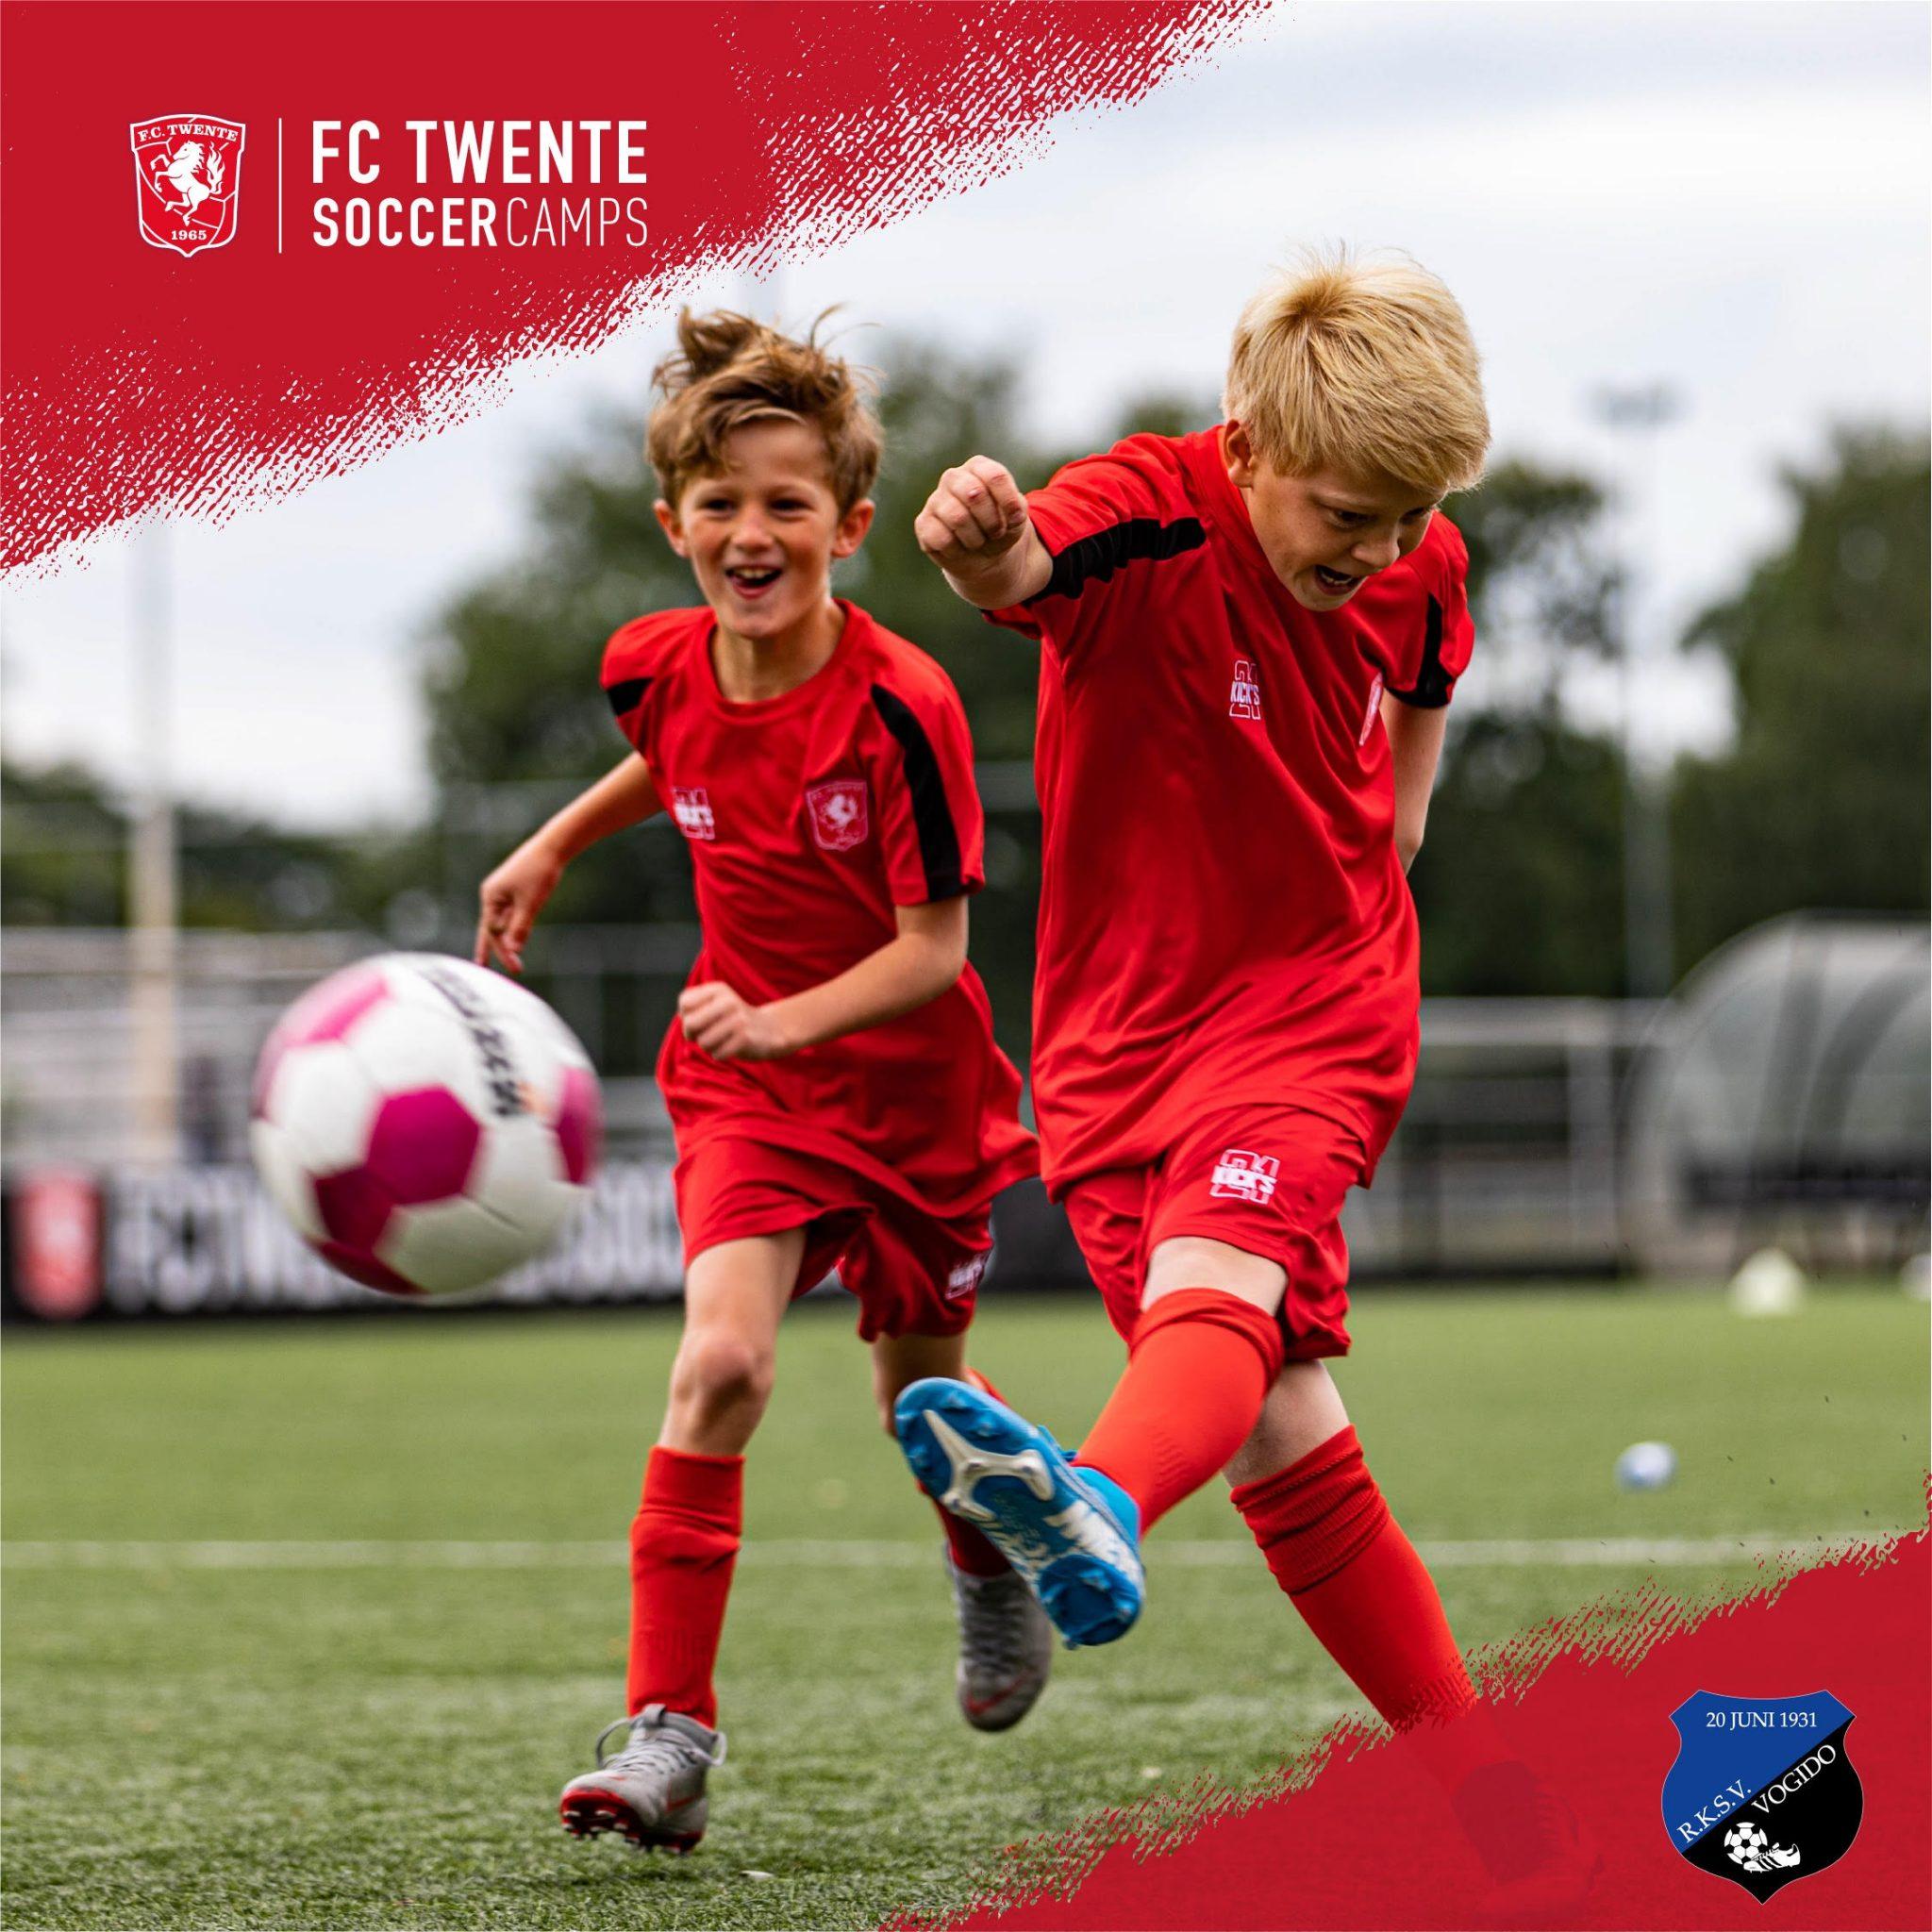 FC Twente Soccer Camp en Keeperskamp bij RKSV VOGIDO